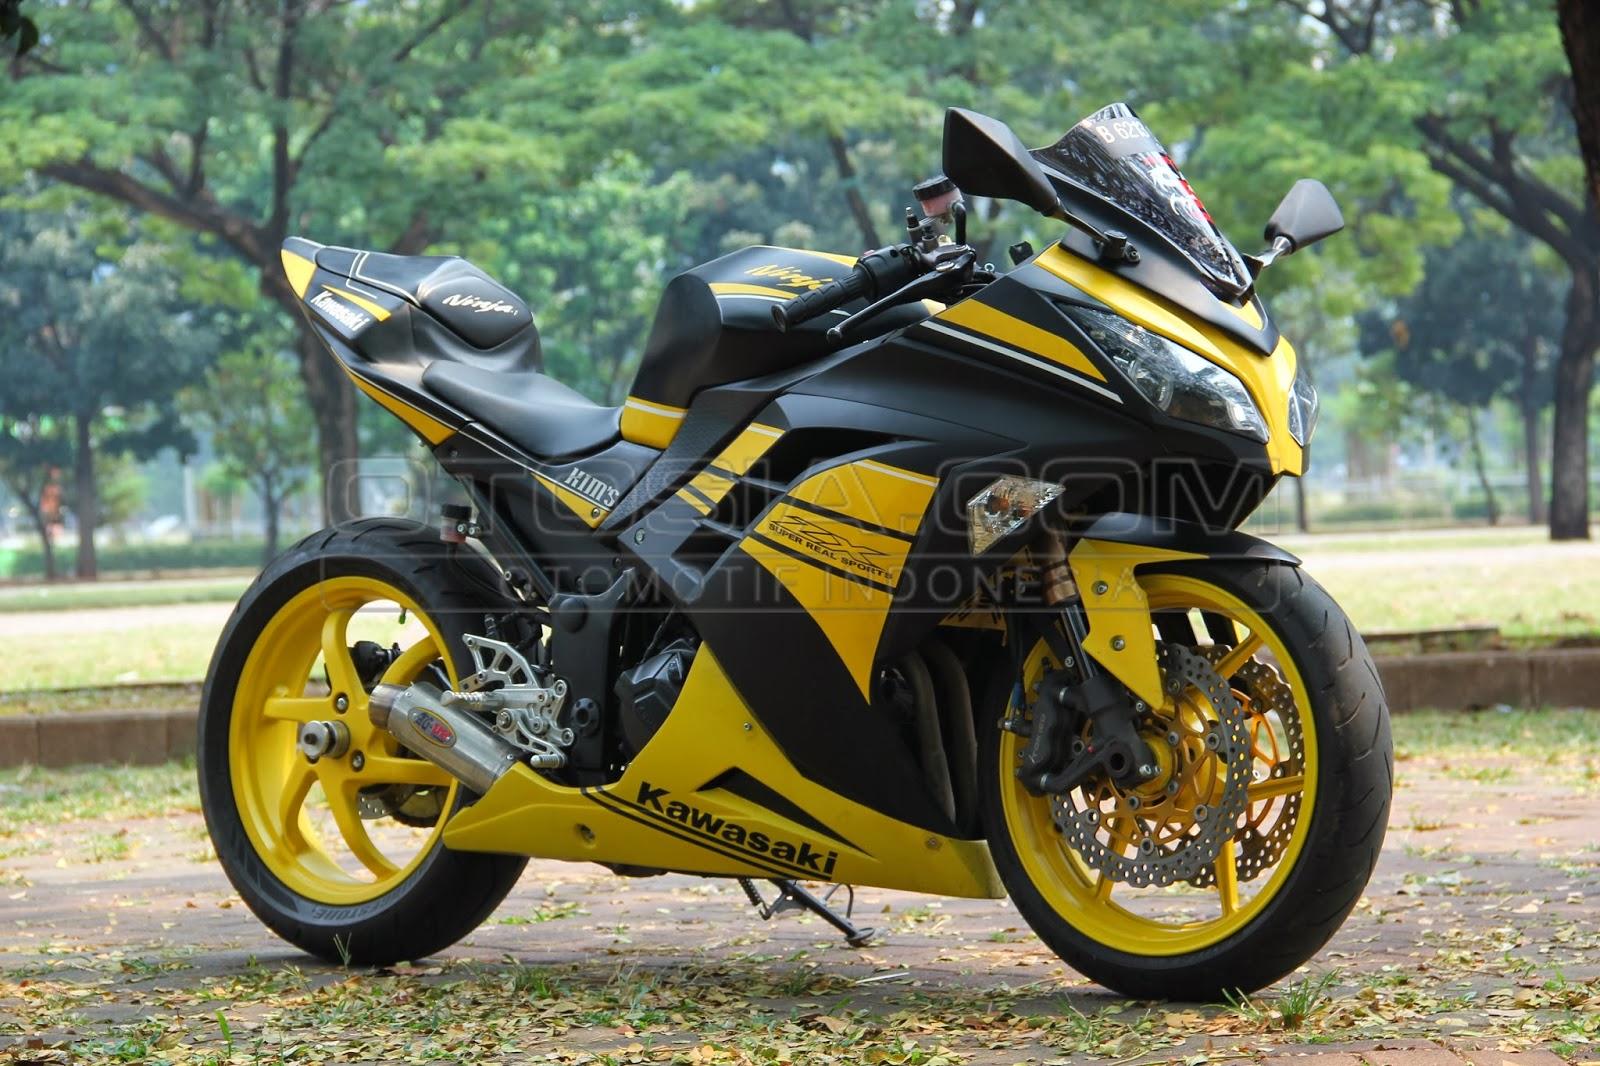 99 Gambar Motor Kawasaki Ninja Paling Keren Terbaru Gubuk Modifikasi